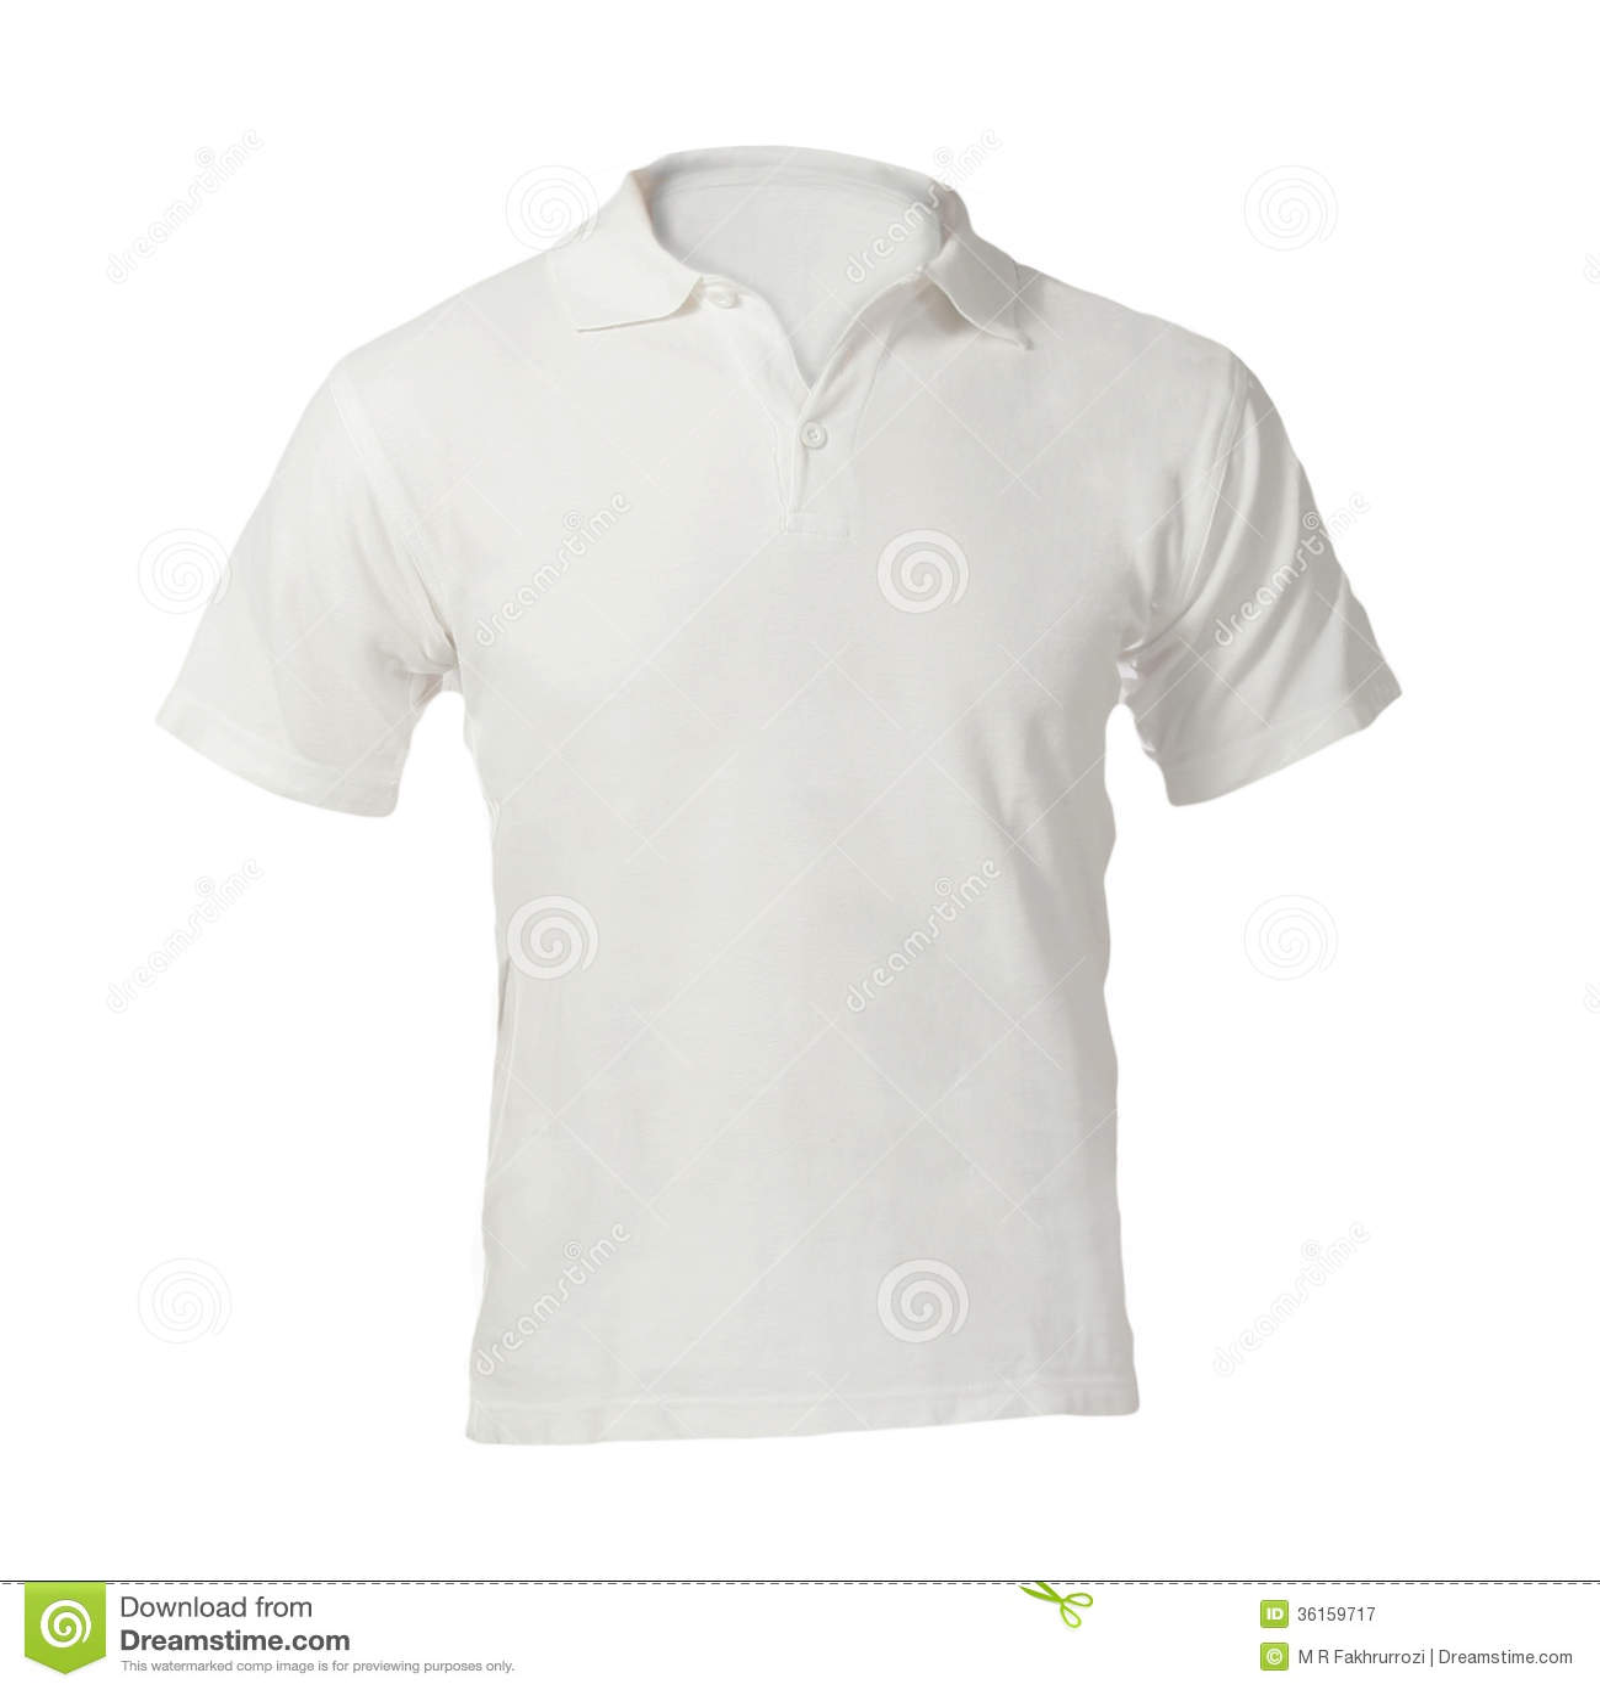 Shirt design white - Men S Blank White Polo Shirt Template Royalty Free Stock Photography